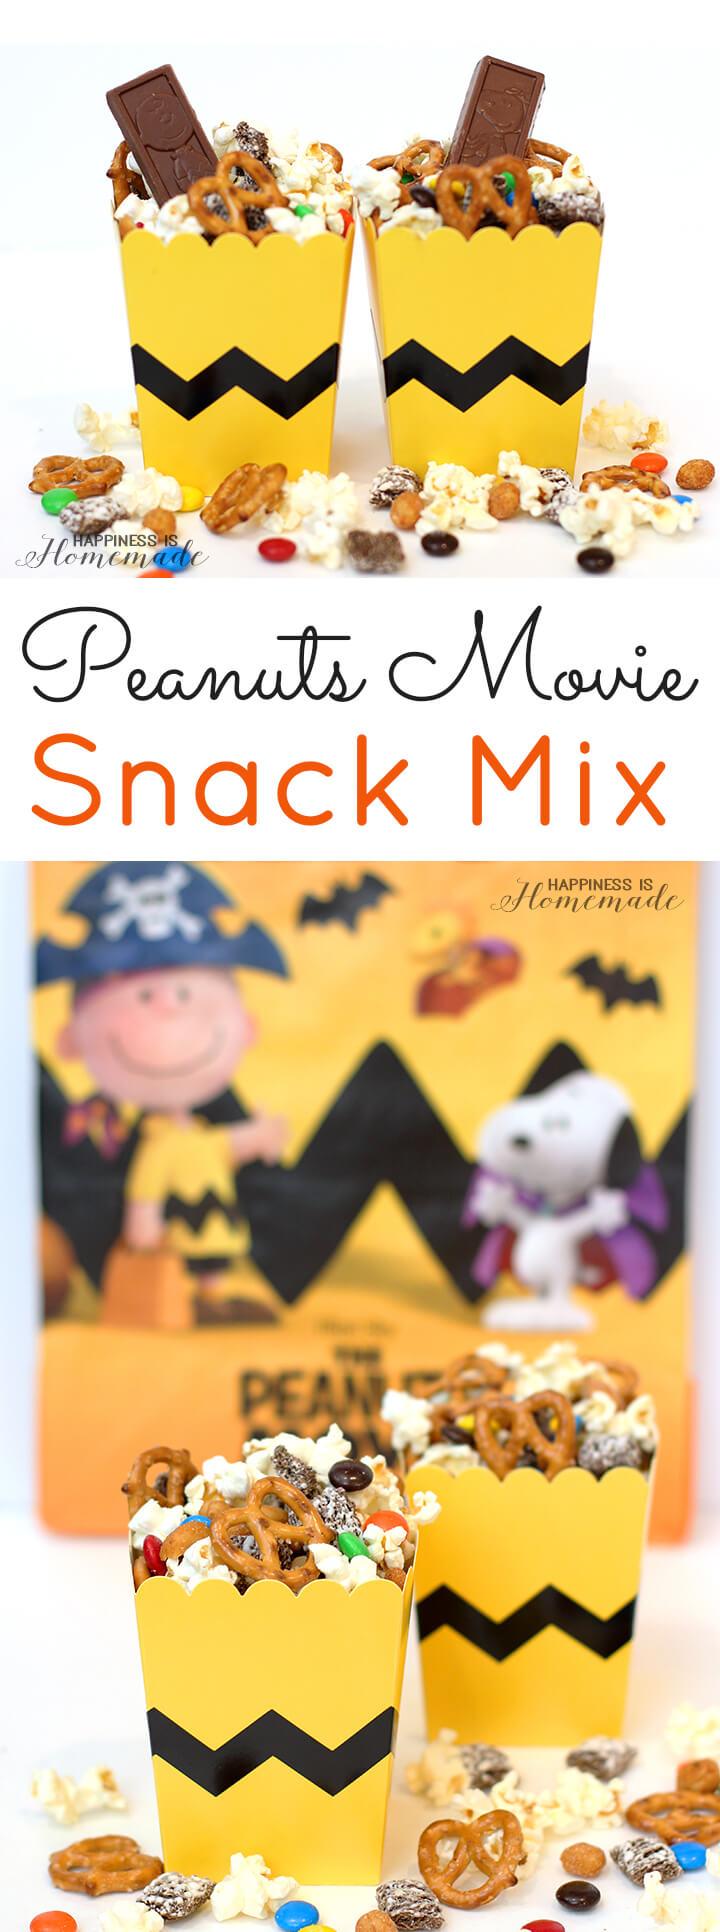 New Peanuts Movie Snack Mix